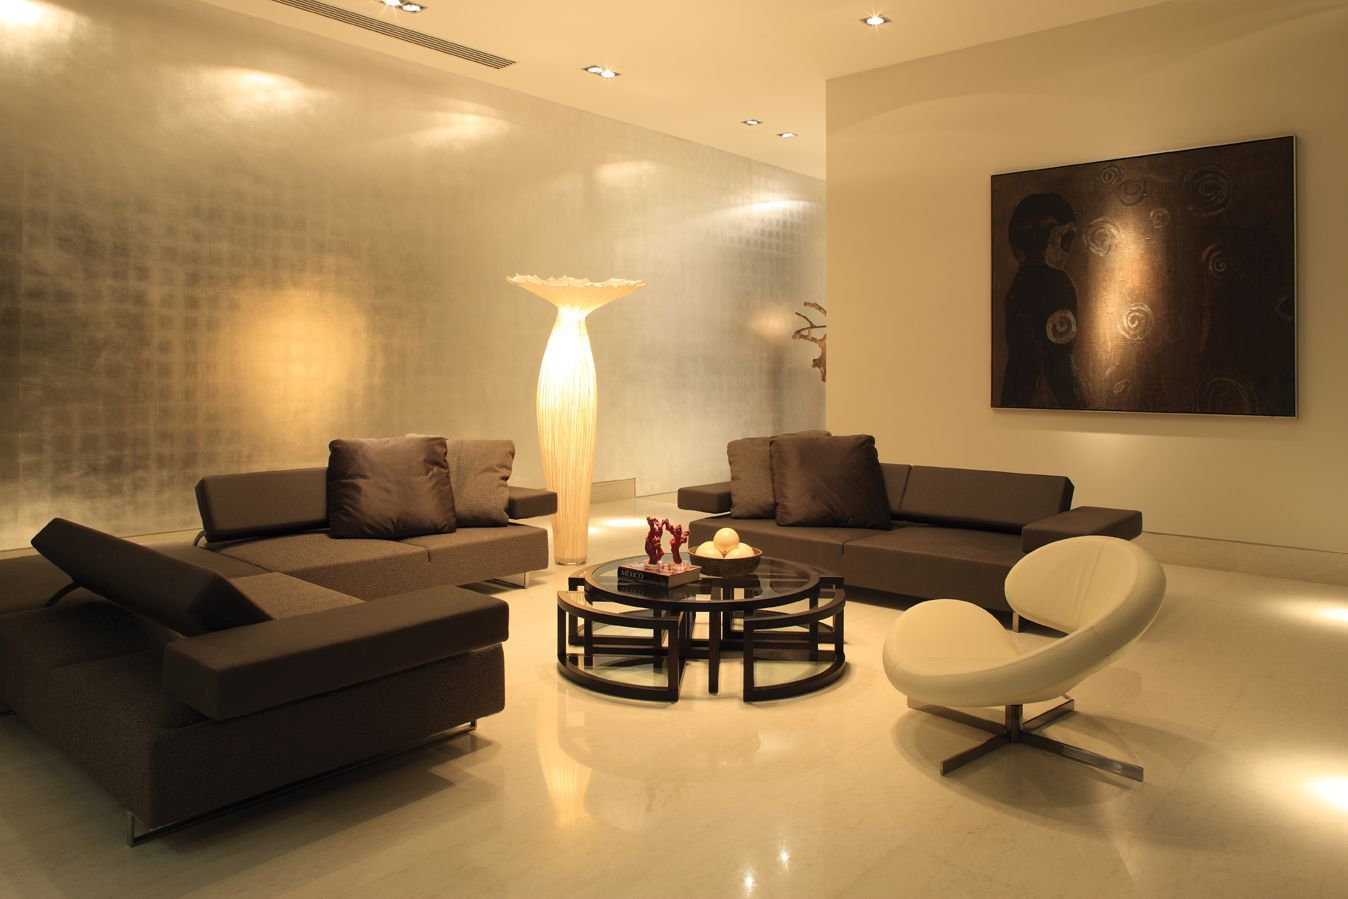 8589130435199-home-design-wallpaper-hd